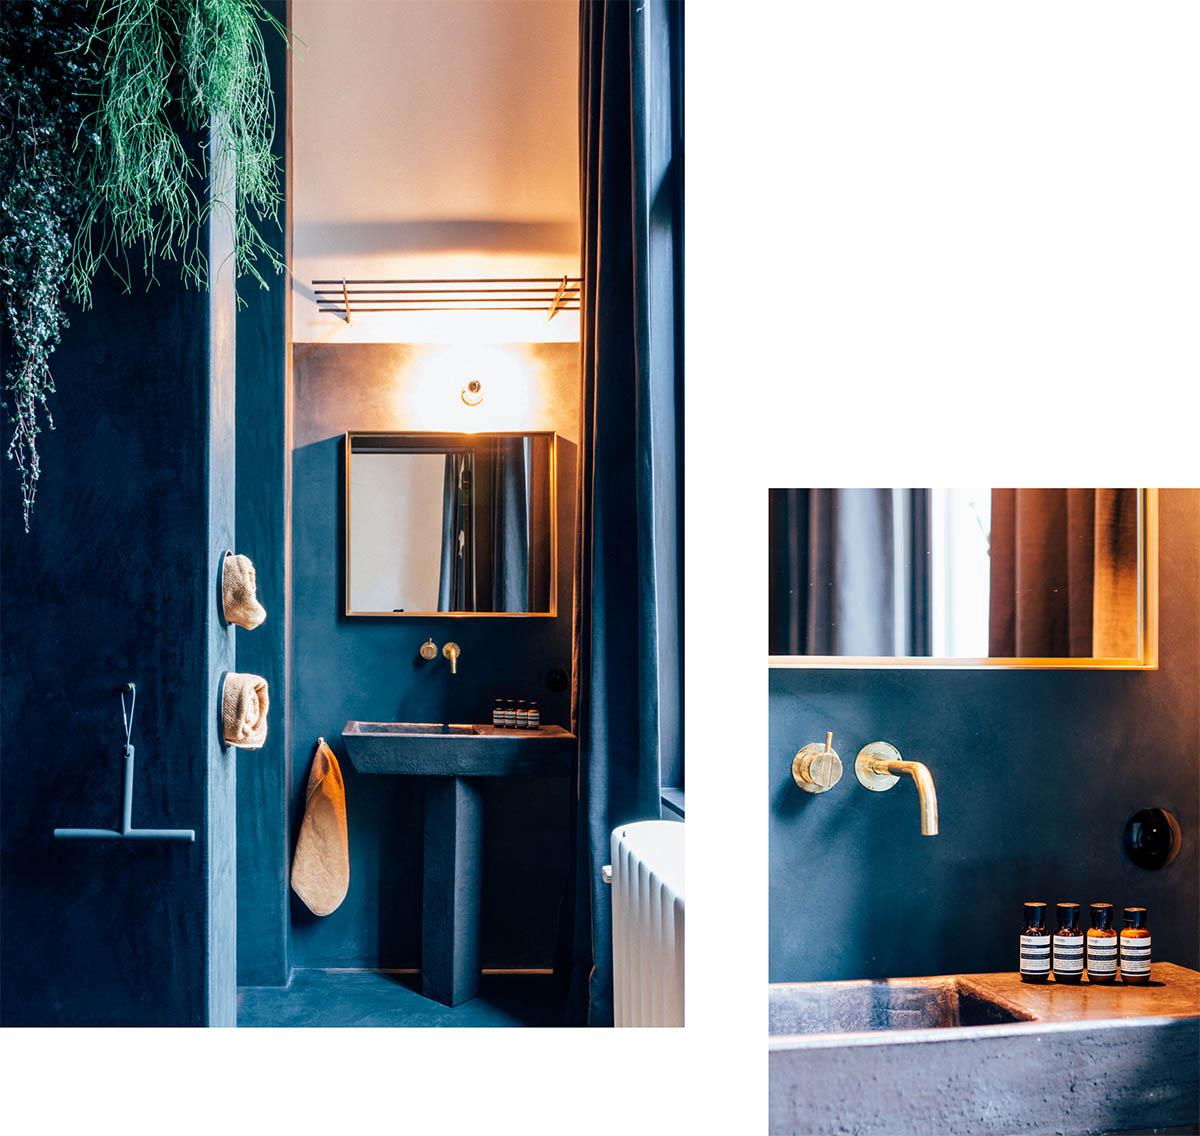 EXPLORED_ Kind of OJ, a bed & breakfast in Bruges